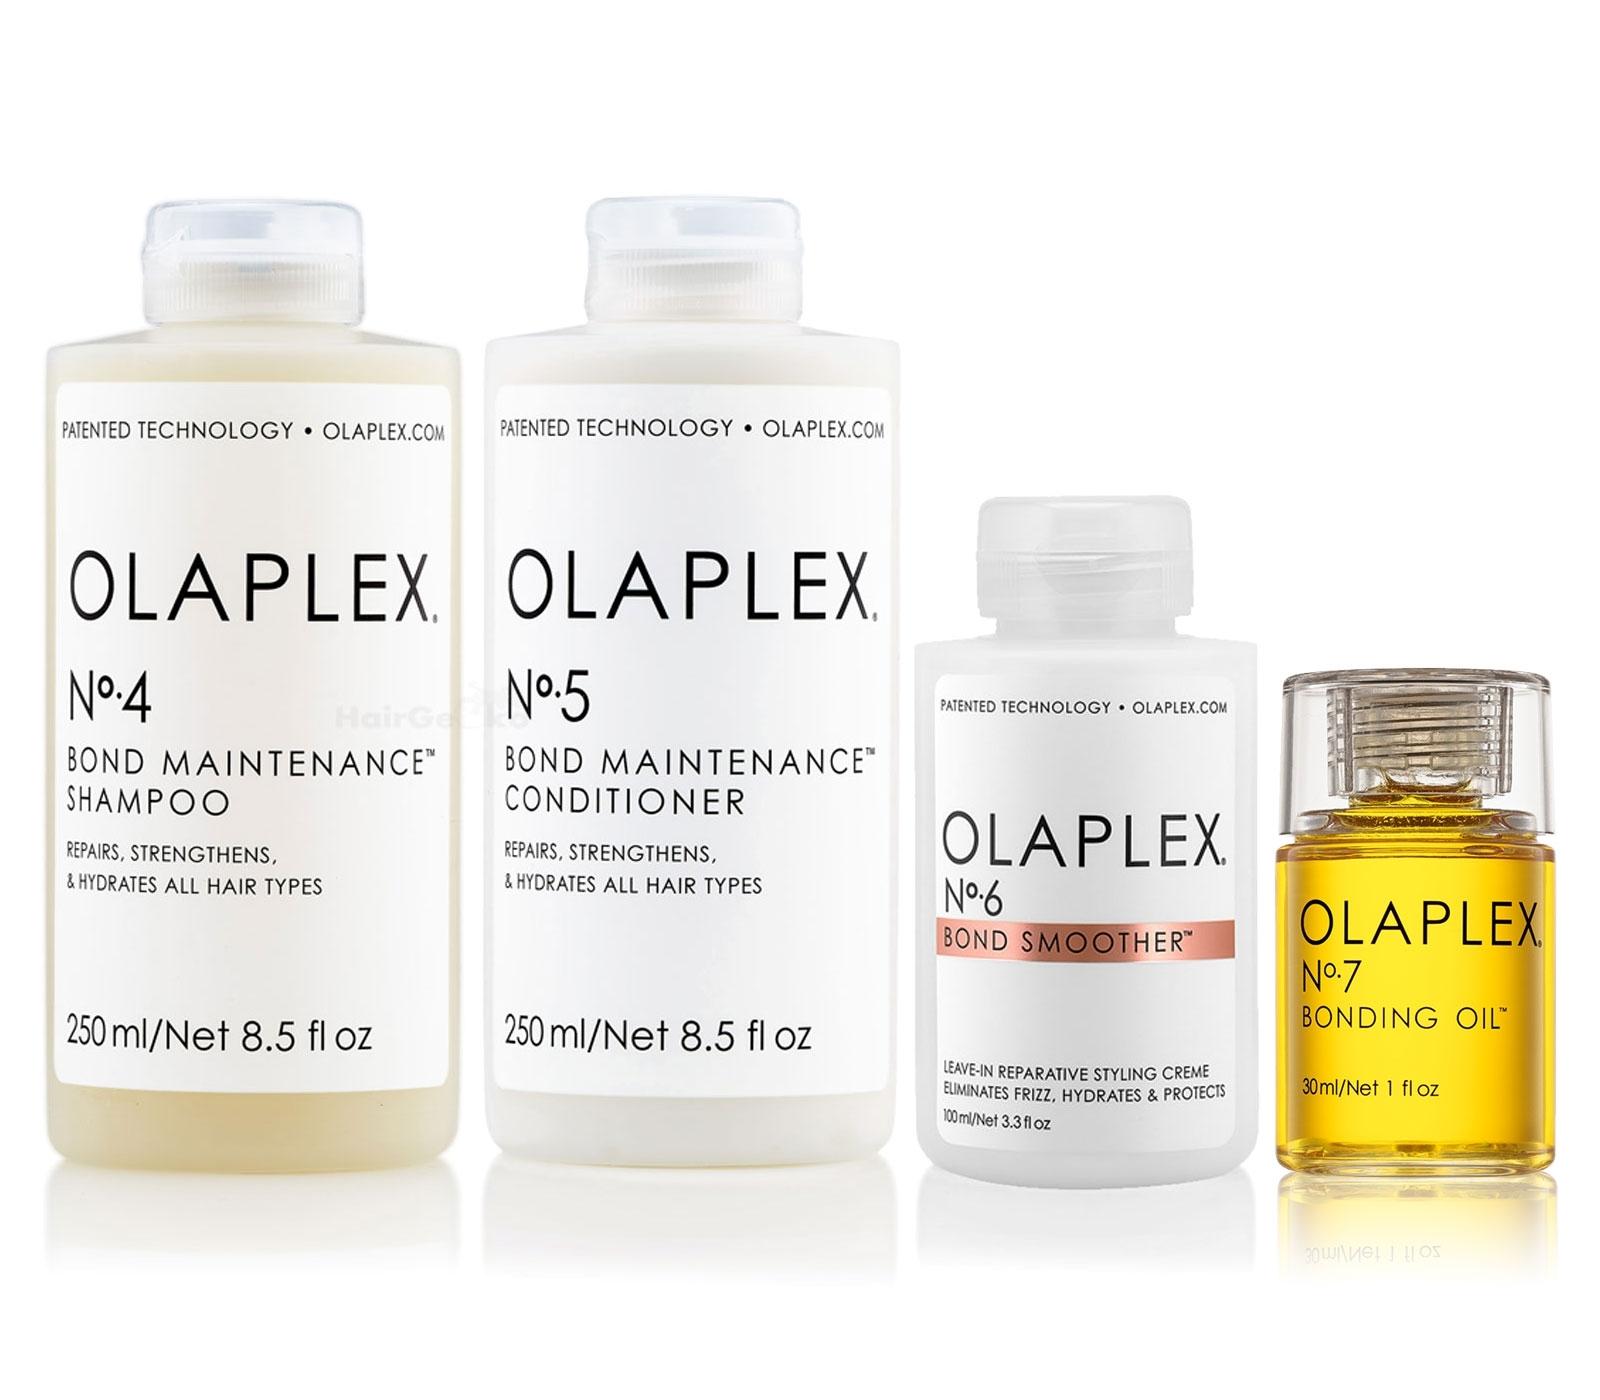 Olaplex Set - Olaplex Bond Maintenance Shampoo No 4 (250ml) + Olaplex Bond Maintenance Conditioner No 5 (250ml) + Olaplex Bond Smoother No 6 (100ml) + Olaplex Bonding Oil No 7 (30ml )